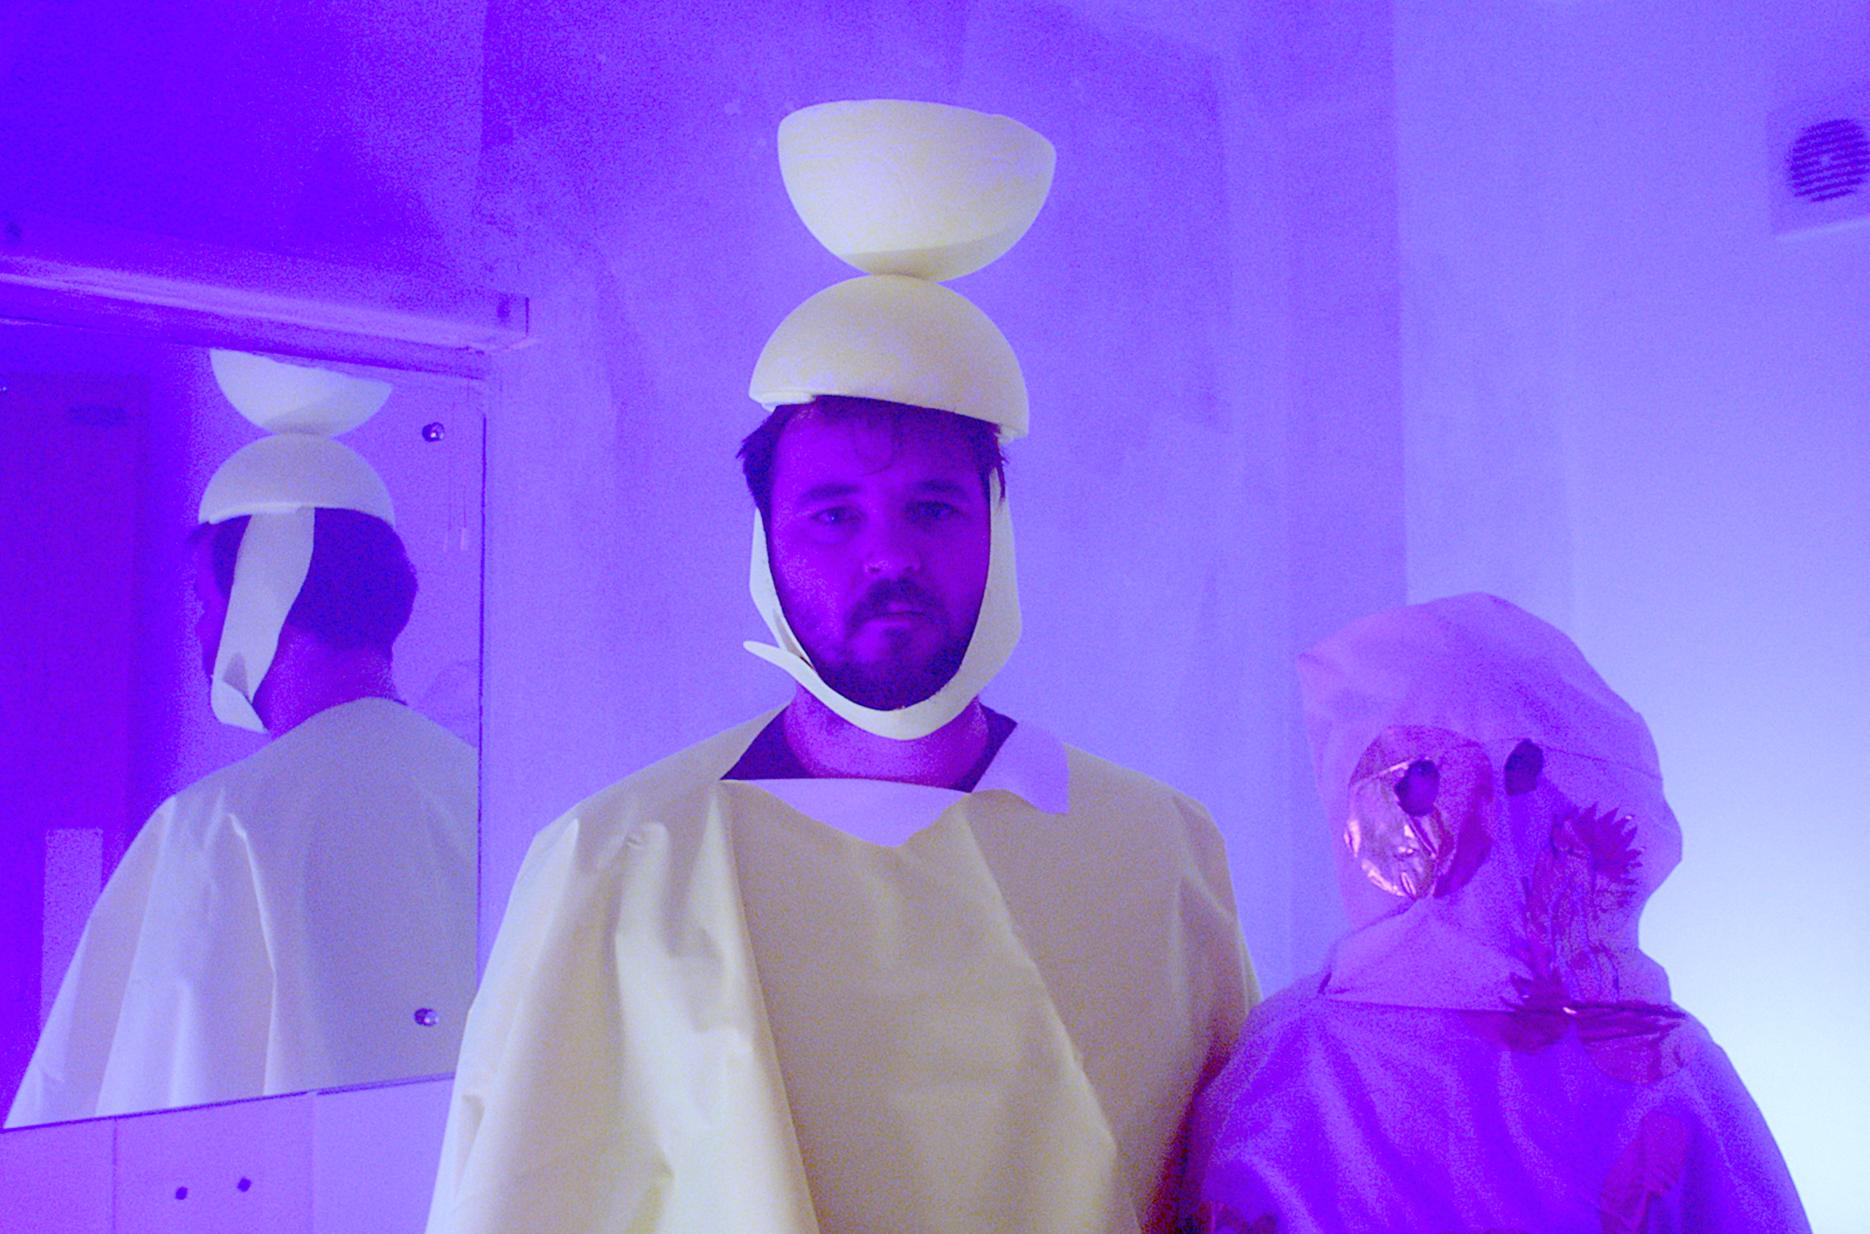 Still from Chloe Langlois' video